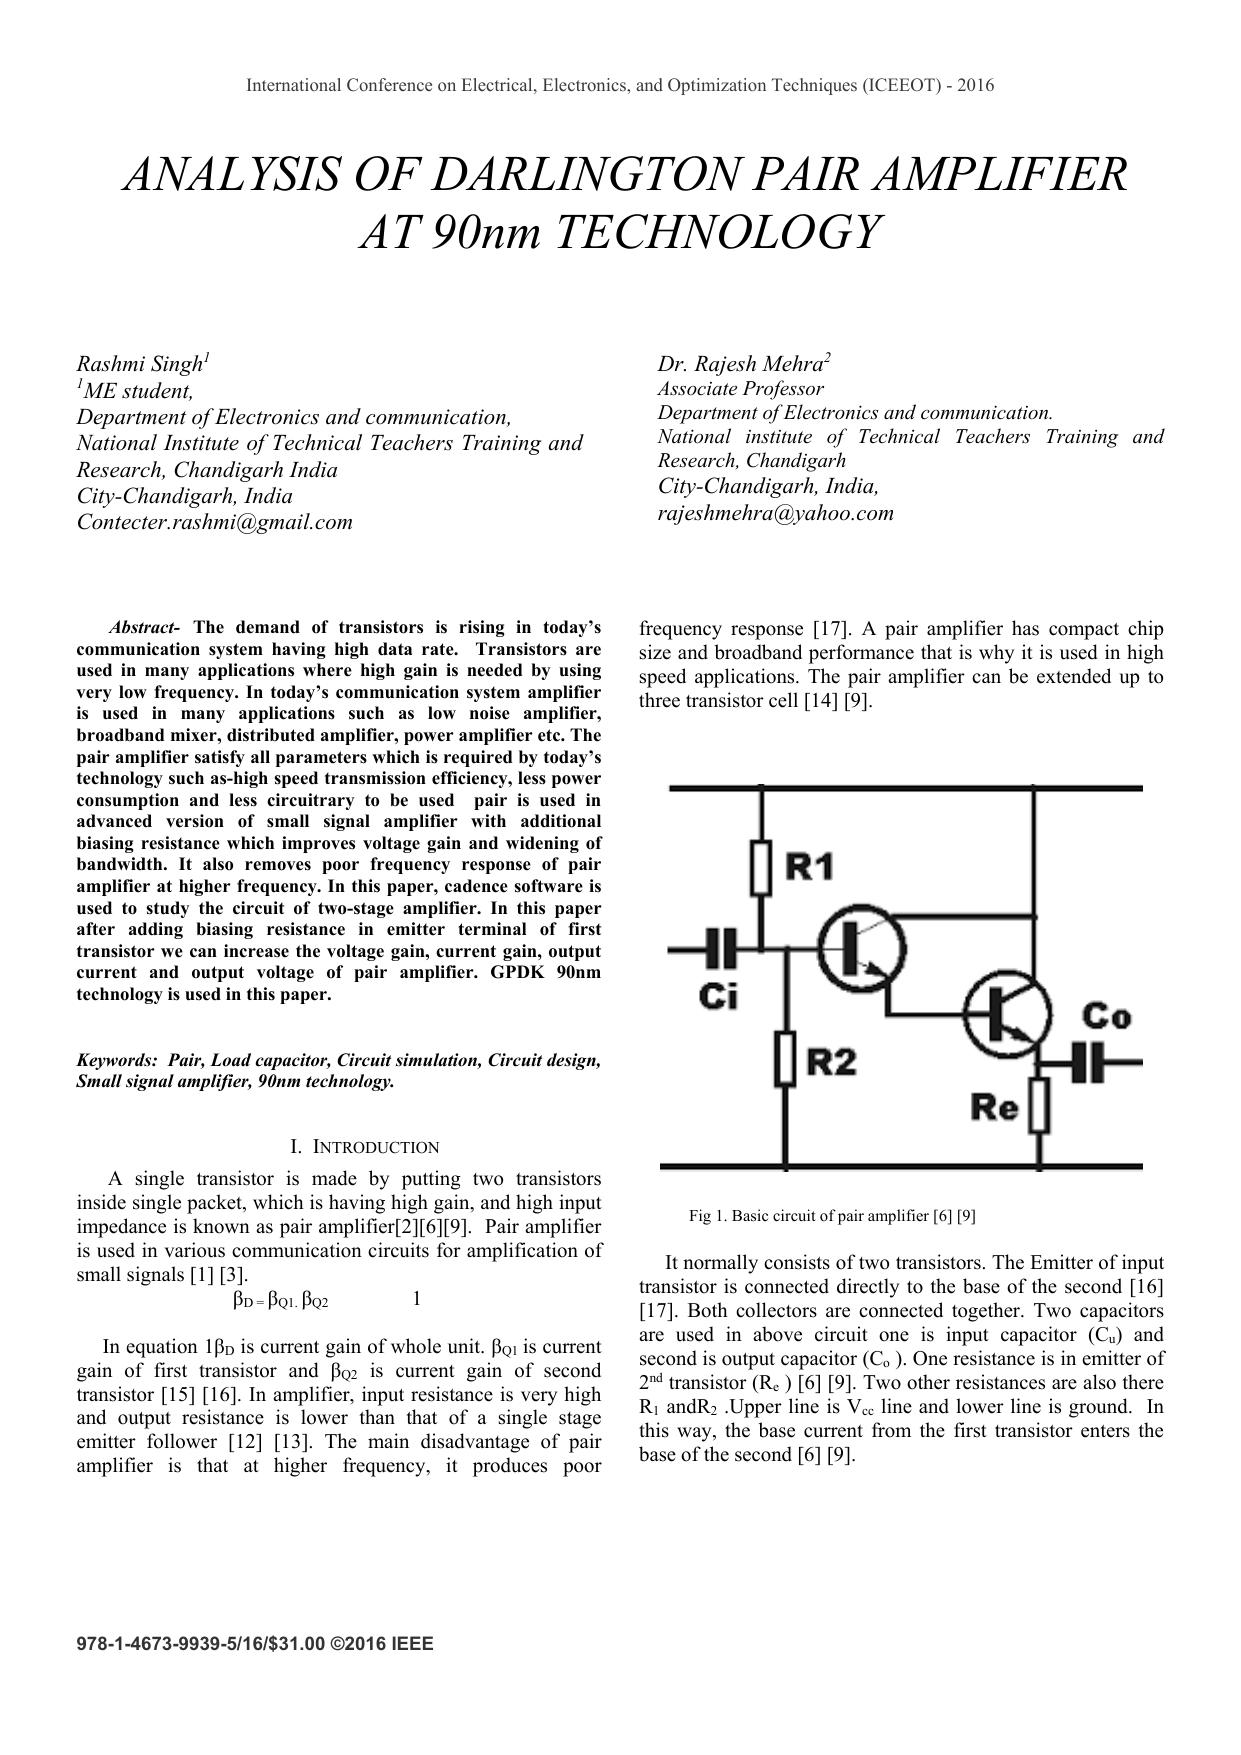 ANALYSIS OF DARLINGTON PAIR AMPLIFIER AT 90nm